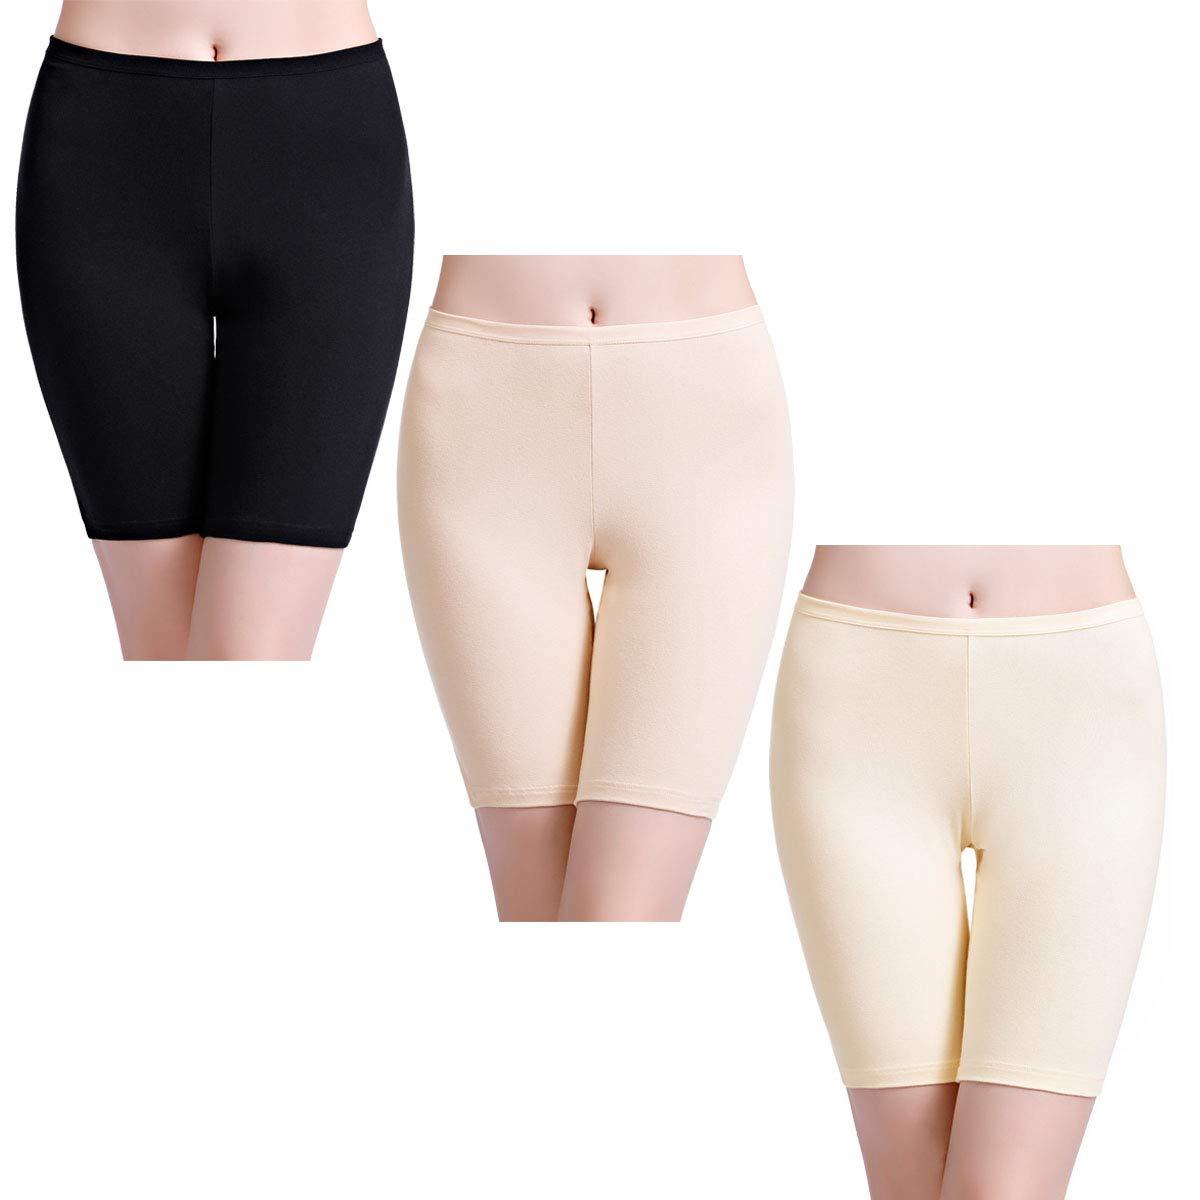 wirarpa Womens High Waisted Cotton Shorts Anti Chafing Underwear Under Dresses Gym Bike Yoga Leggings 3 Pack Size 9